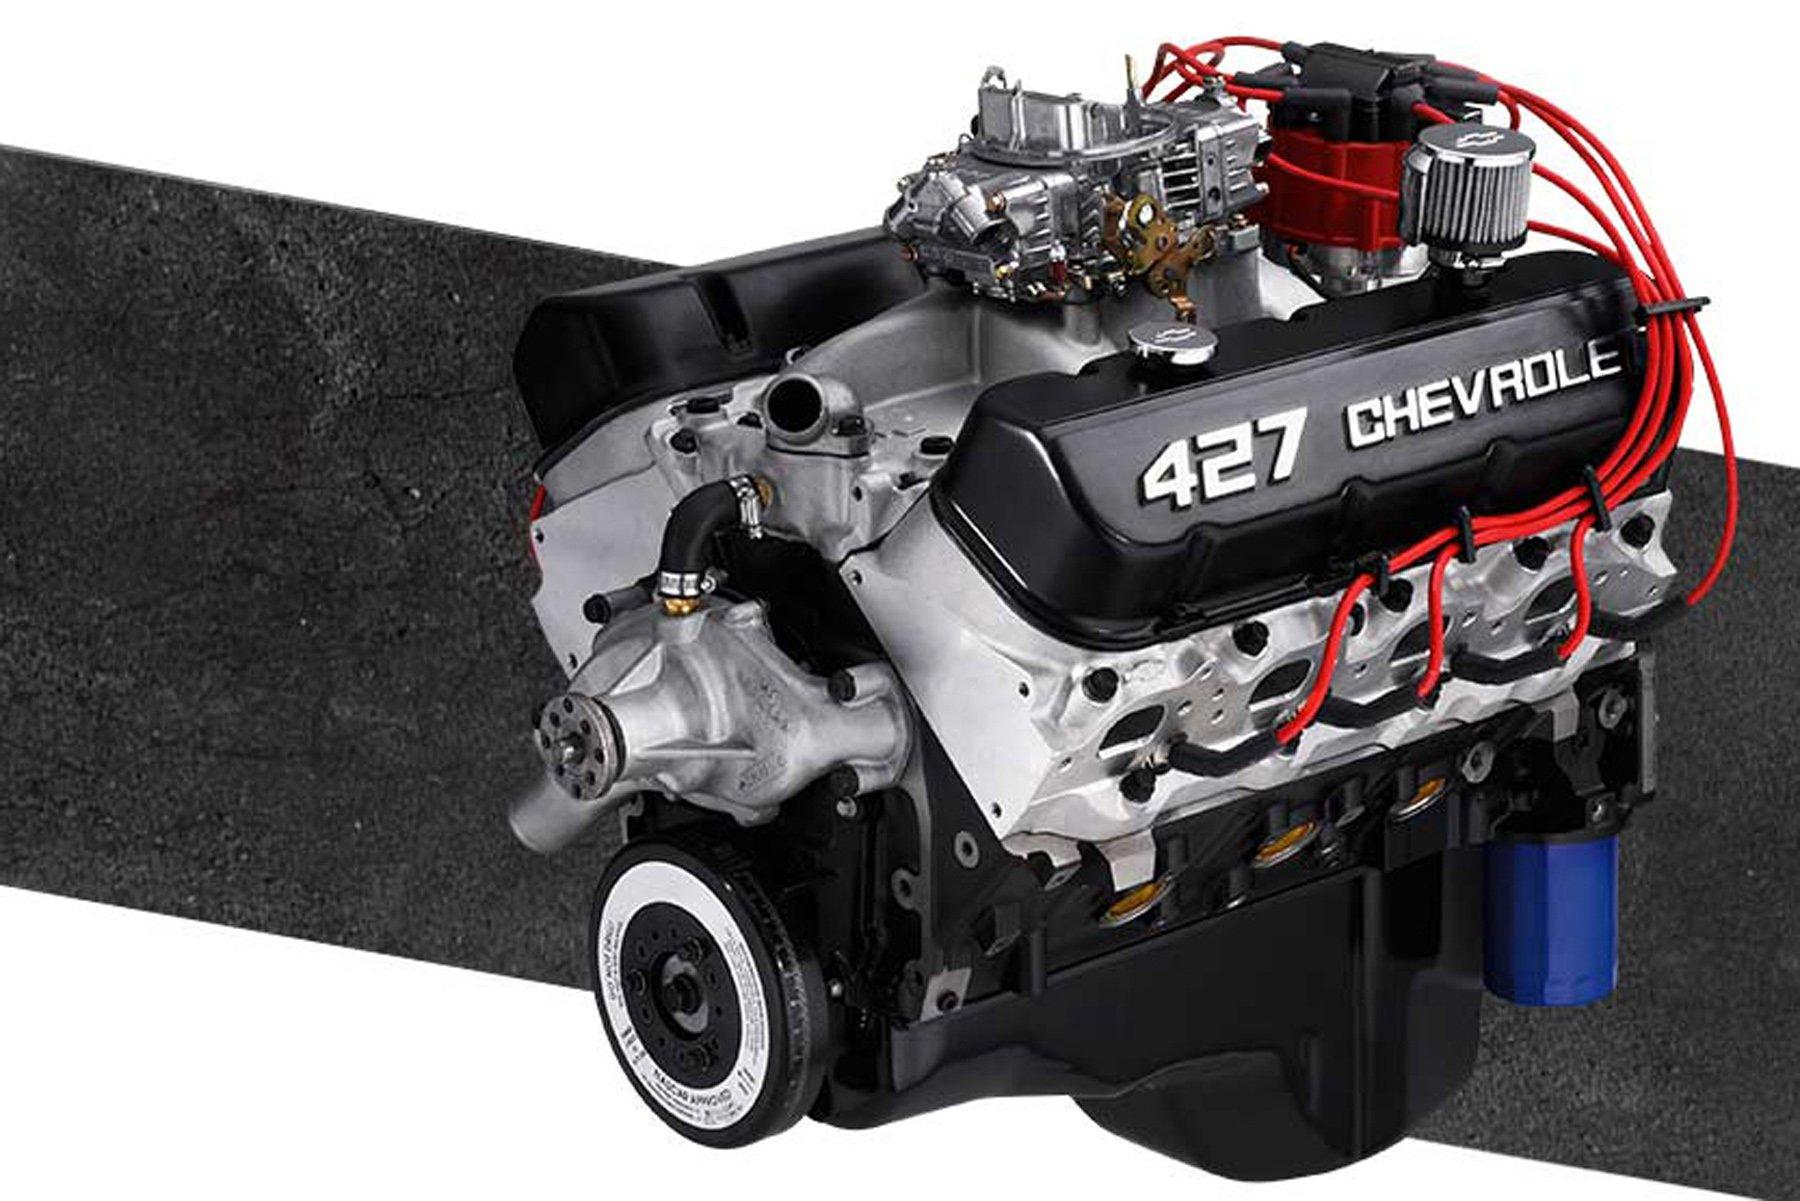 the 427 big block comparing l88 zl1 zz427 engines. Black Bedroom Furniture Sets. Home Design Ideas